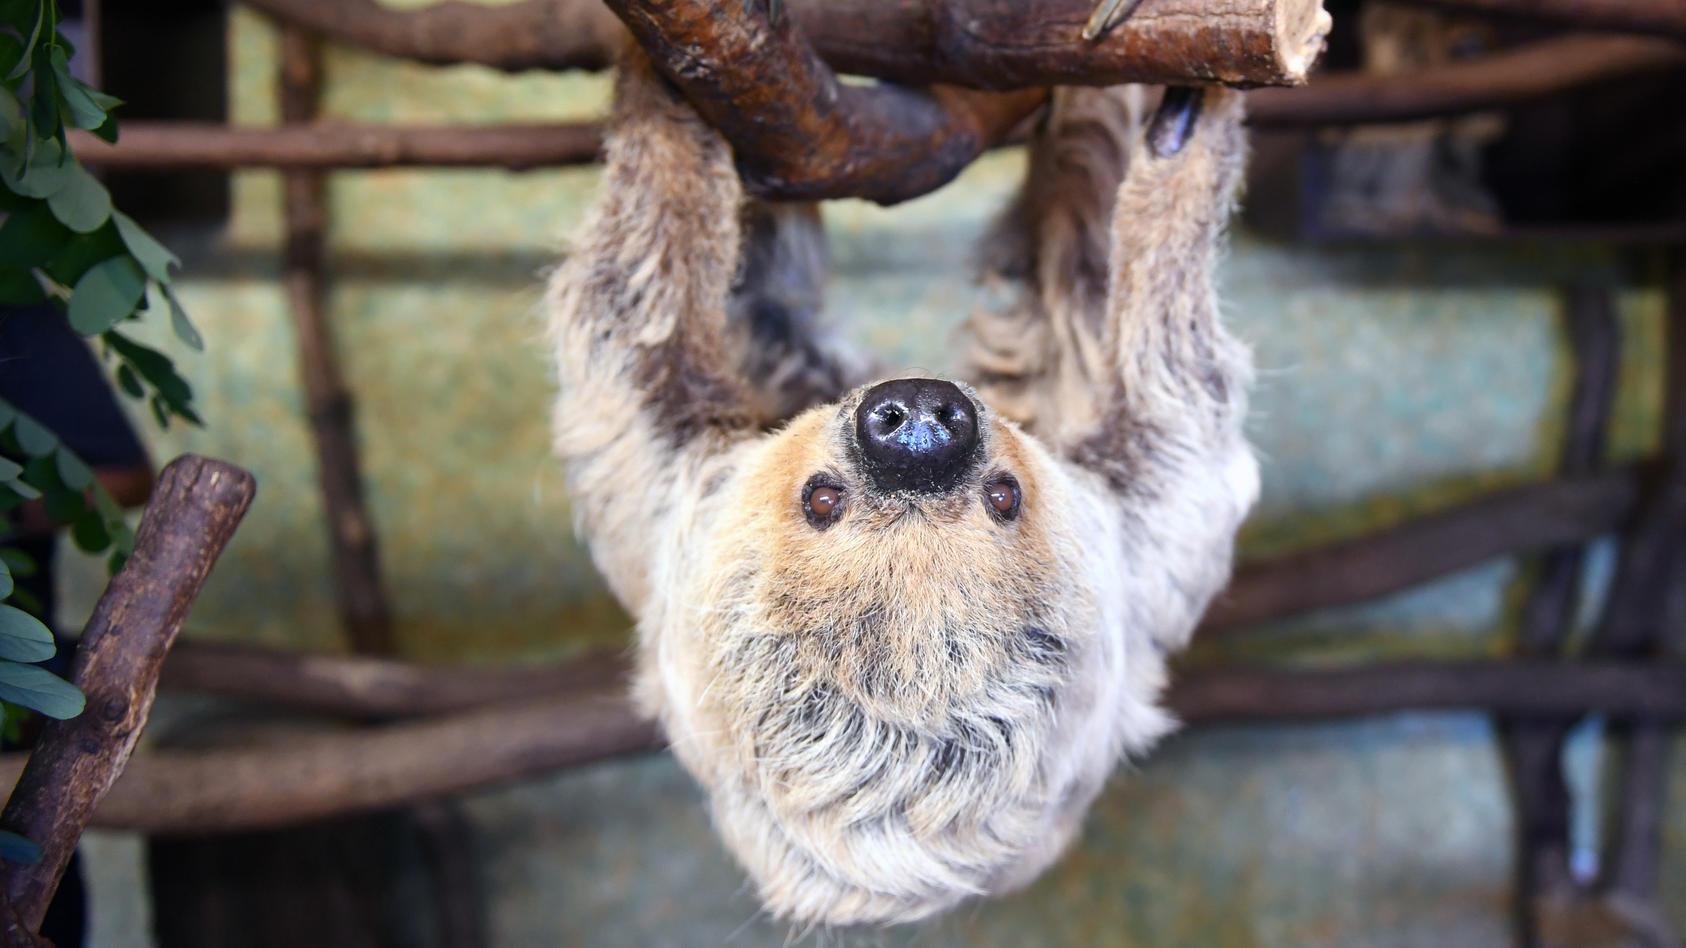 Das Faultier Paula im Zoo von Halle/Saale. Foto: Hendrik Schmidt/zb/dpa